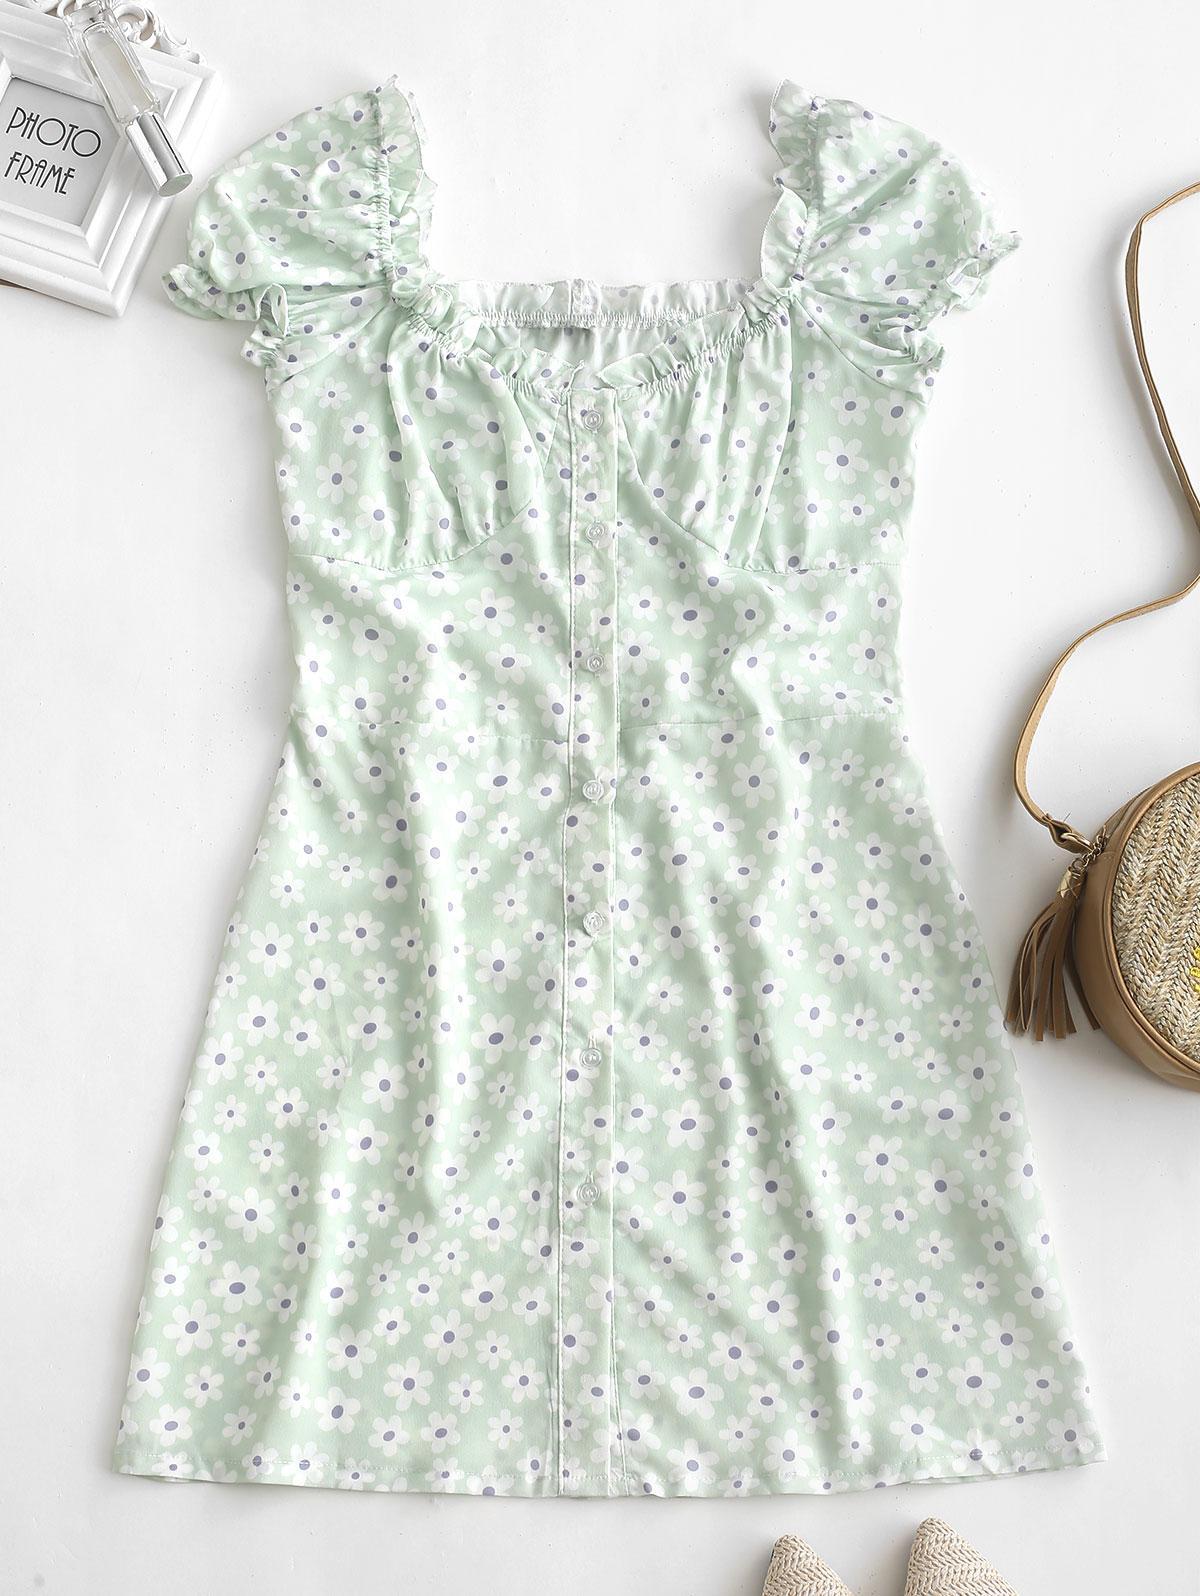 Ruffles Floral Print Button Up Dress, White